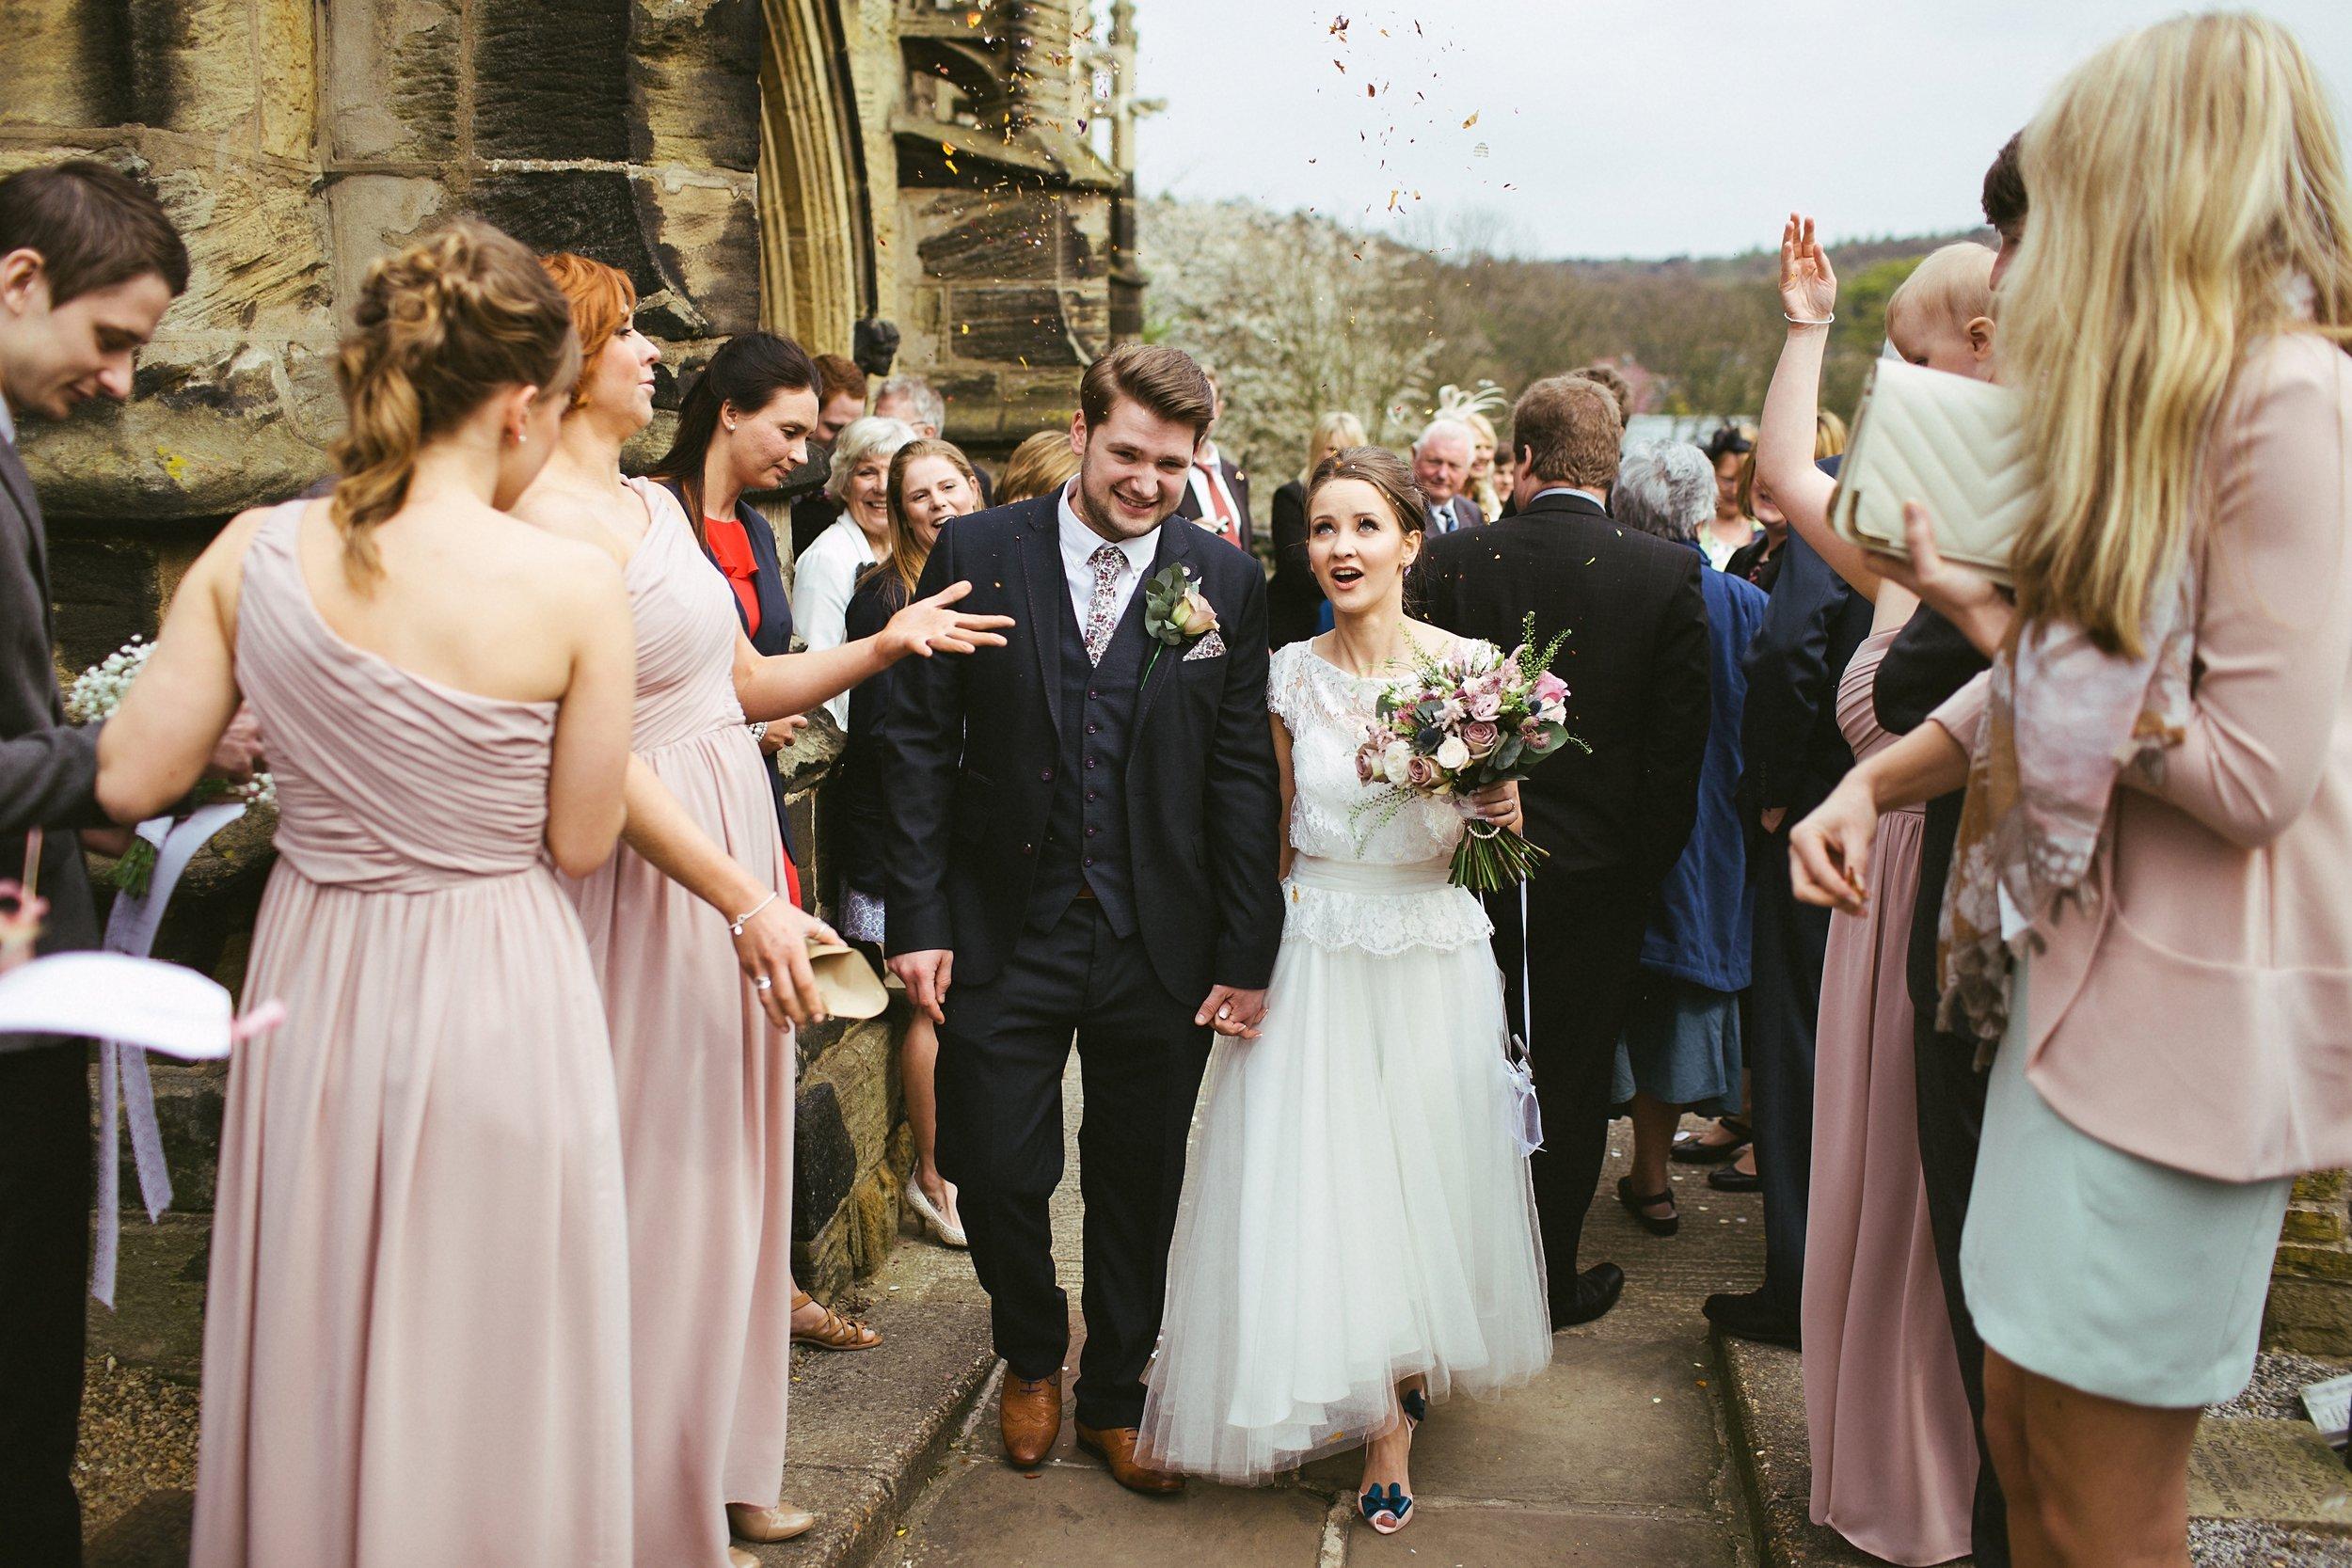 Samantha-Yorkshire-Sheffield-Bespoke-Vintage-Lace-Tulle-Bride-Wedding-Dress-Susanna-Greening-Derbyshire-3